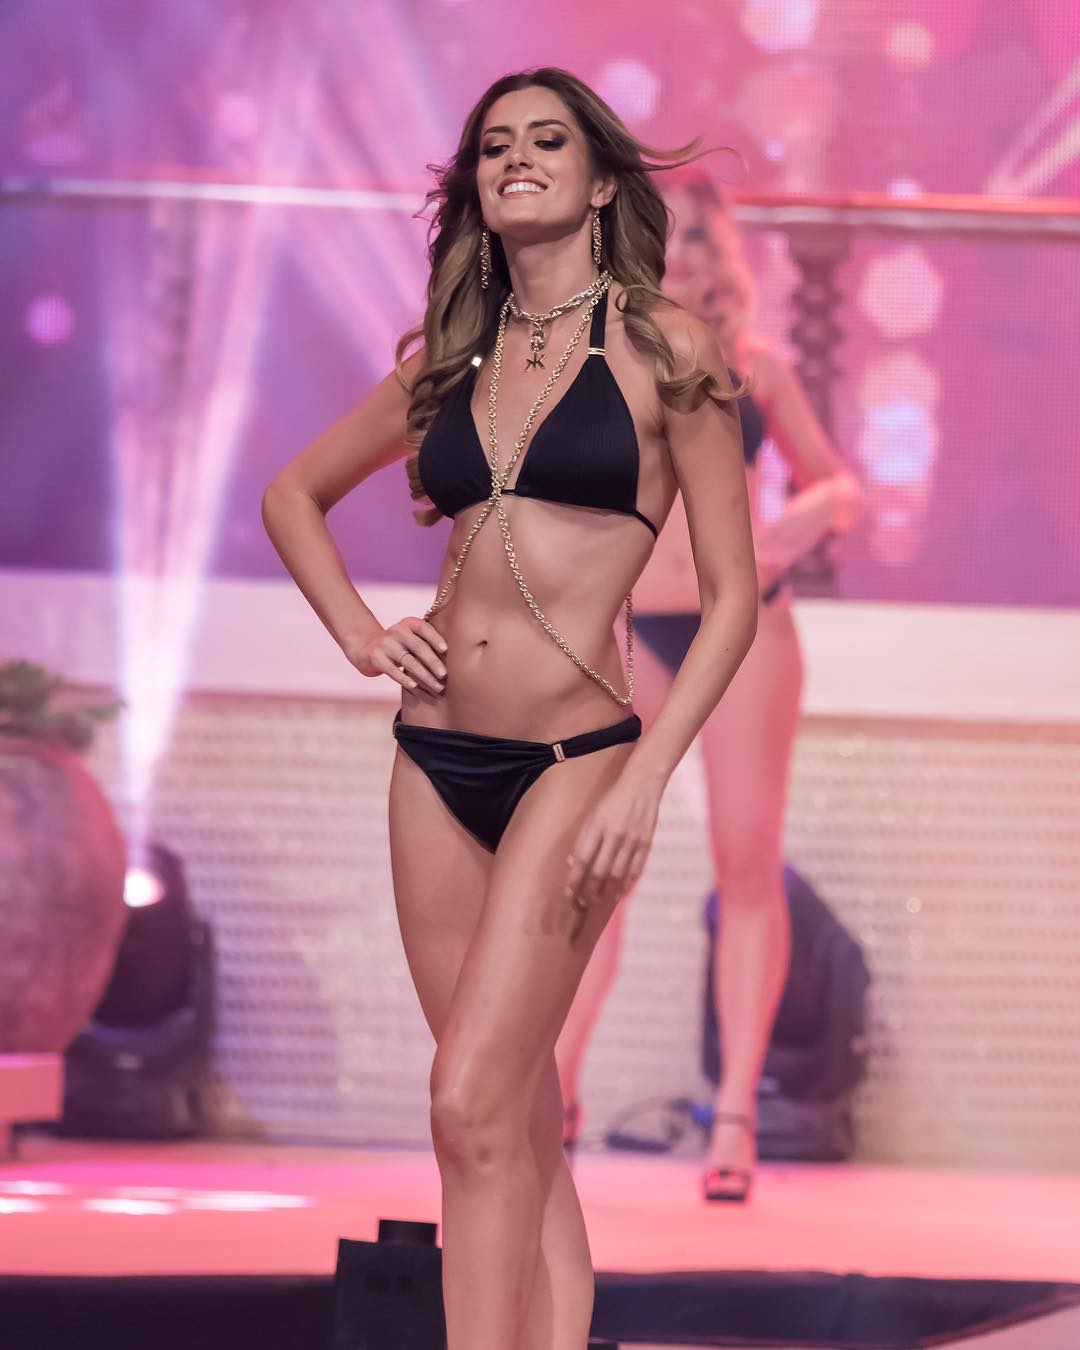 jessica mcfarlane, 7 finalista de reyna hispanoamericana 2018. - Página 4 45384310